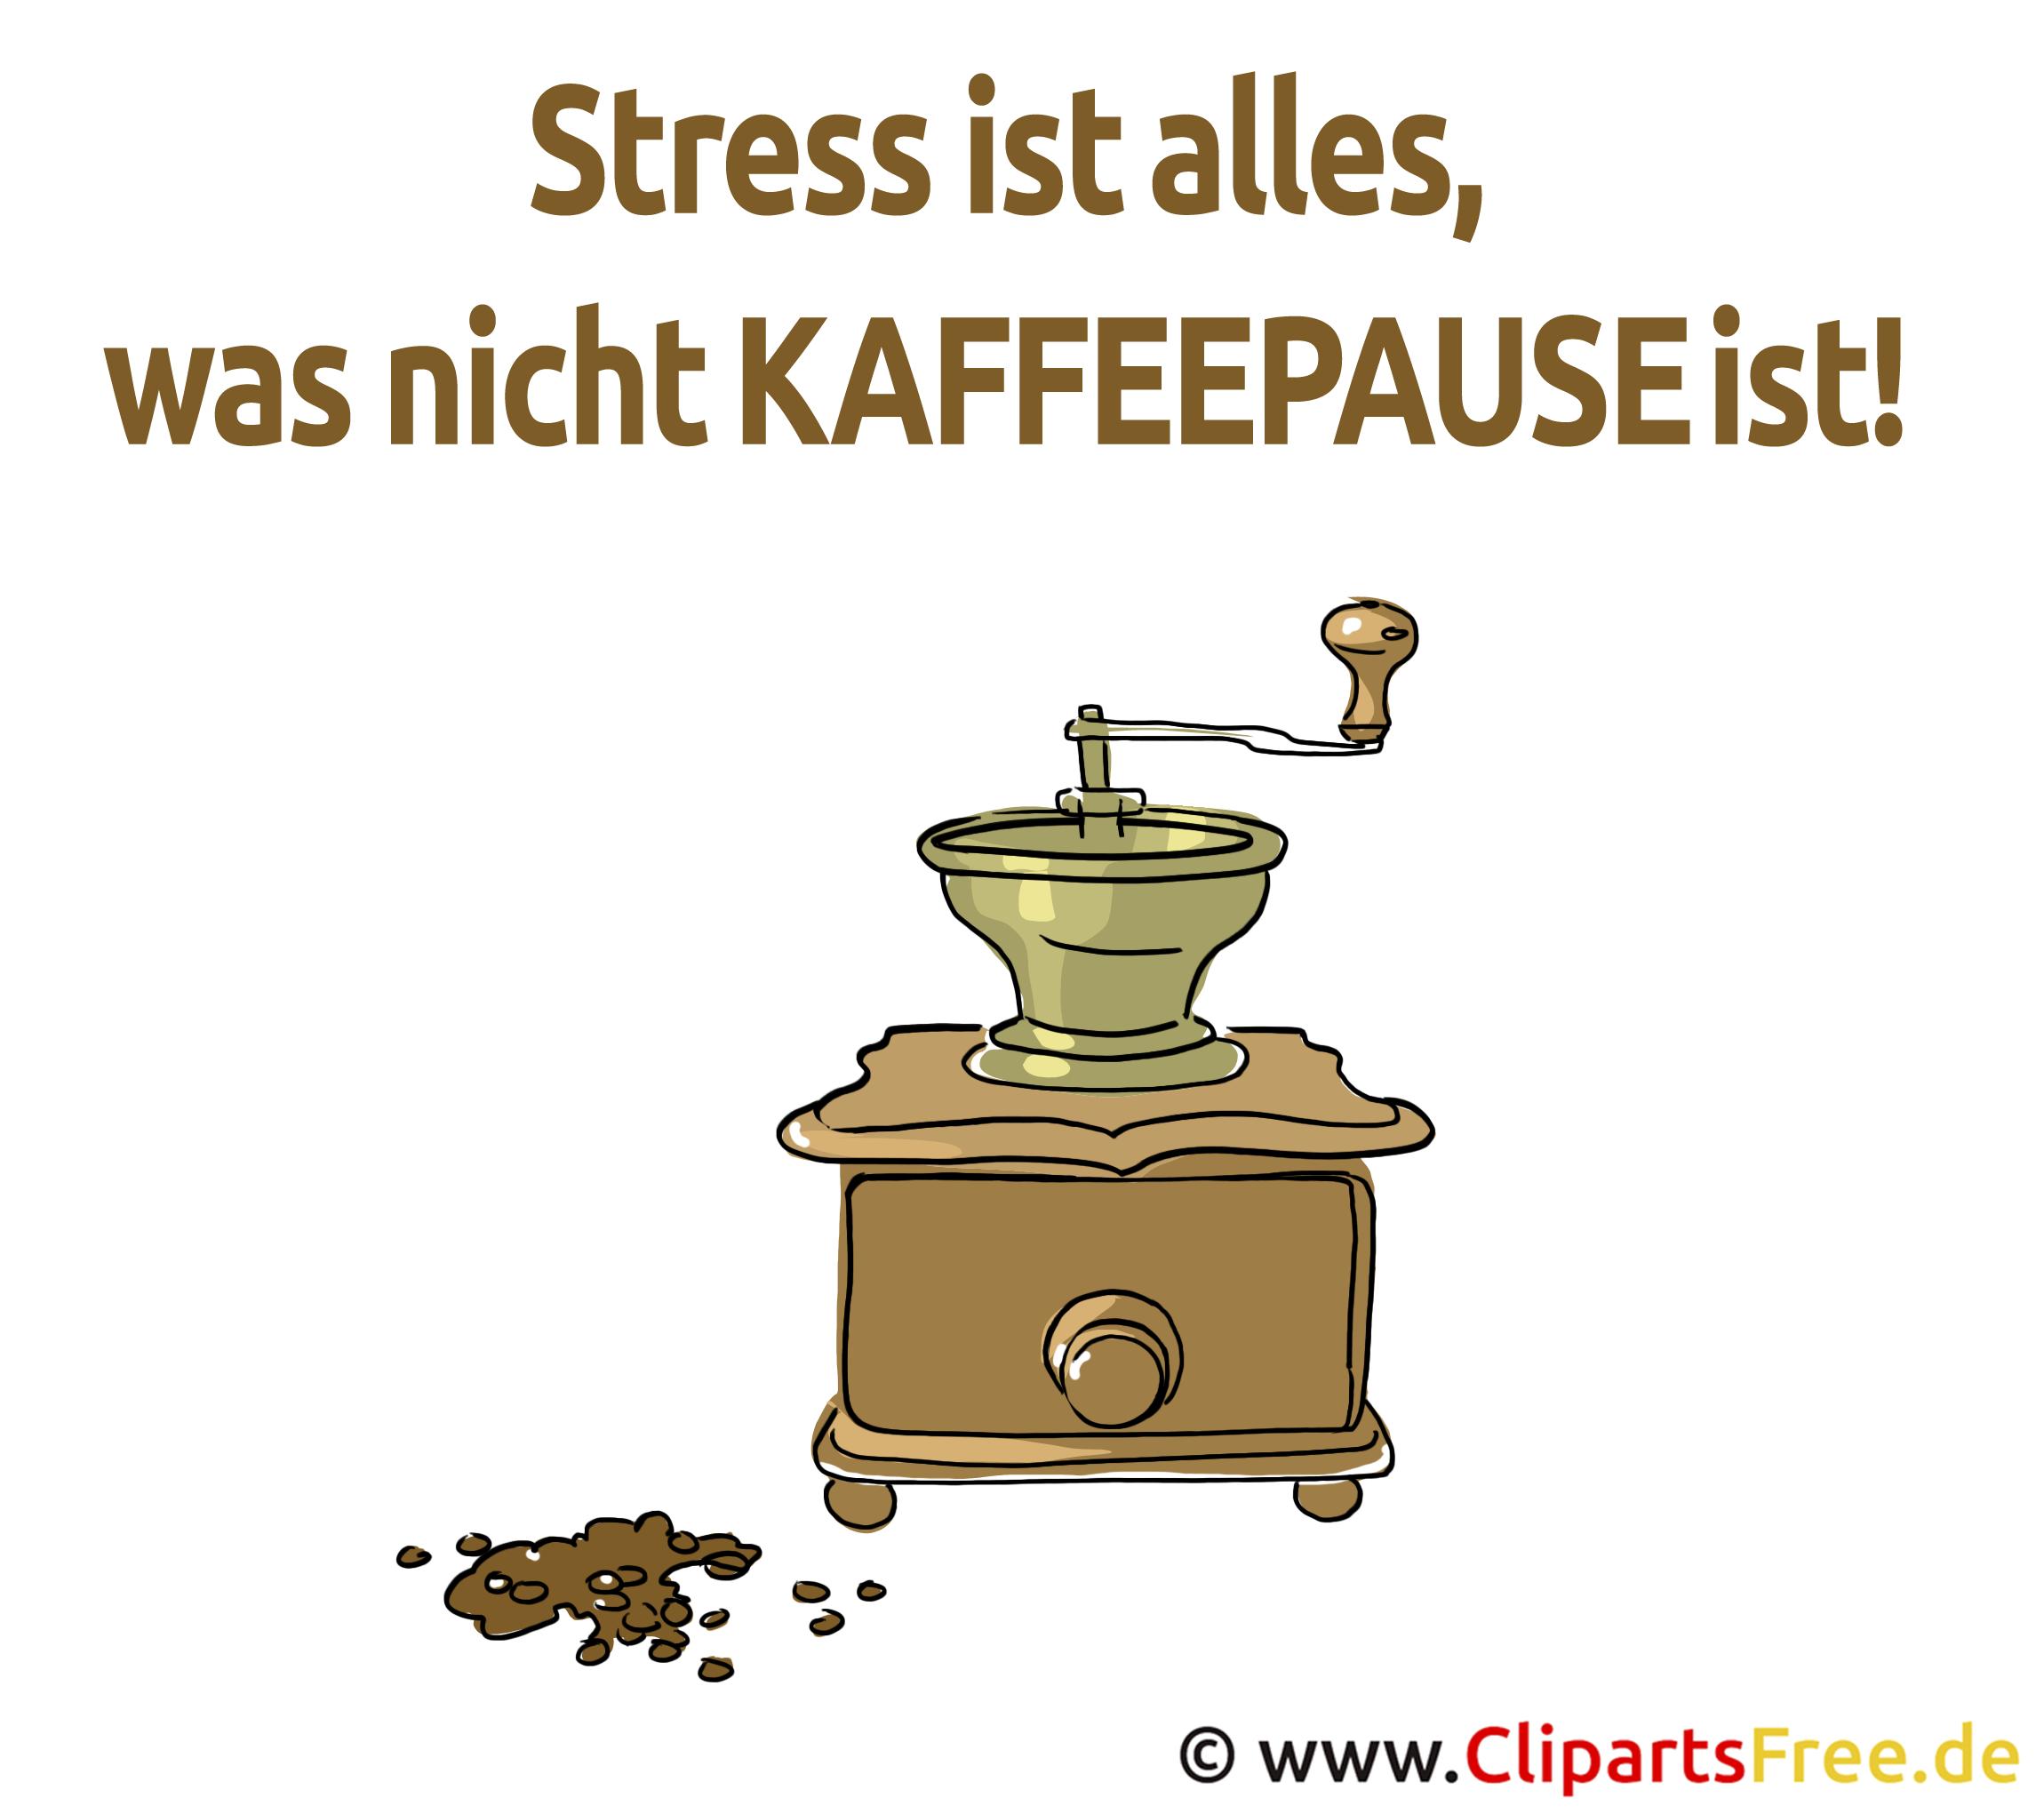 [Bild: stress_ist_alles_was_nicht_kaffeepause_i...843766.png]